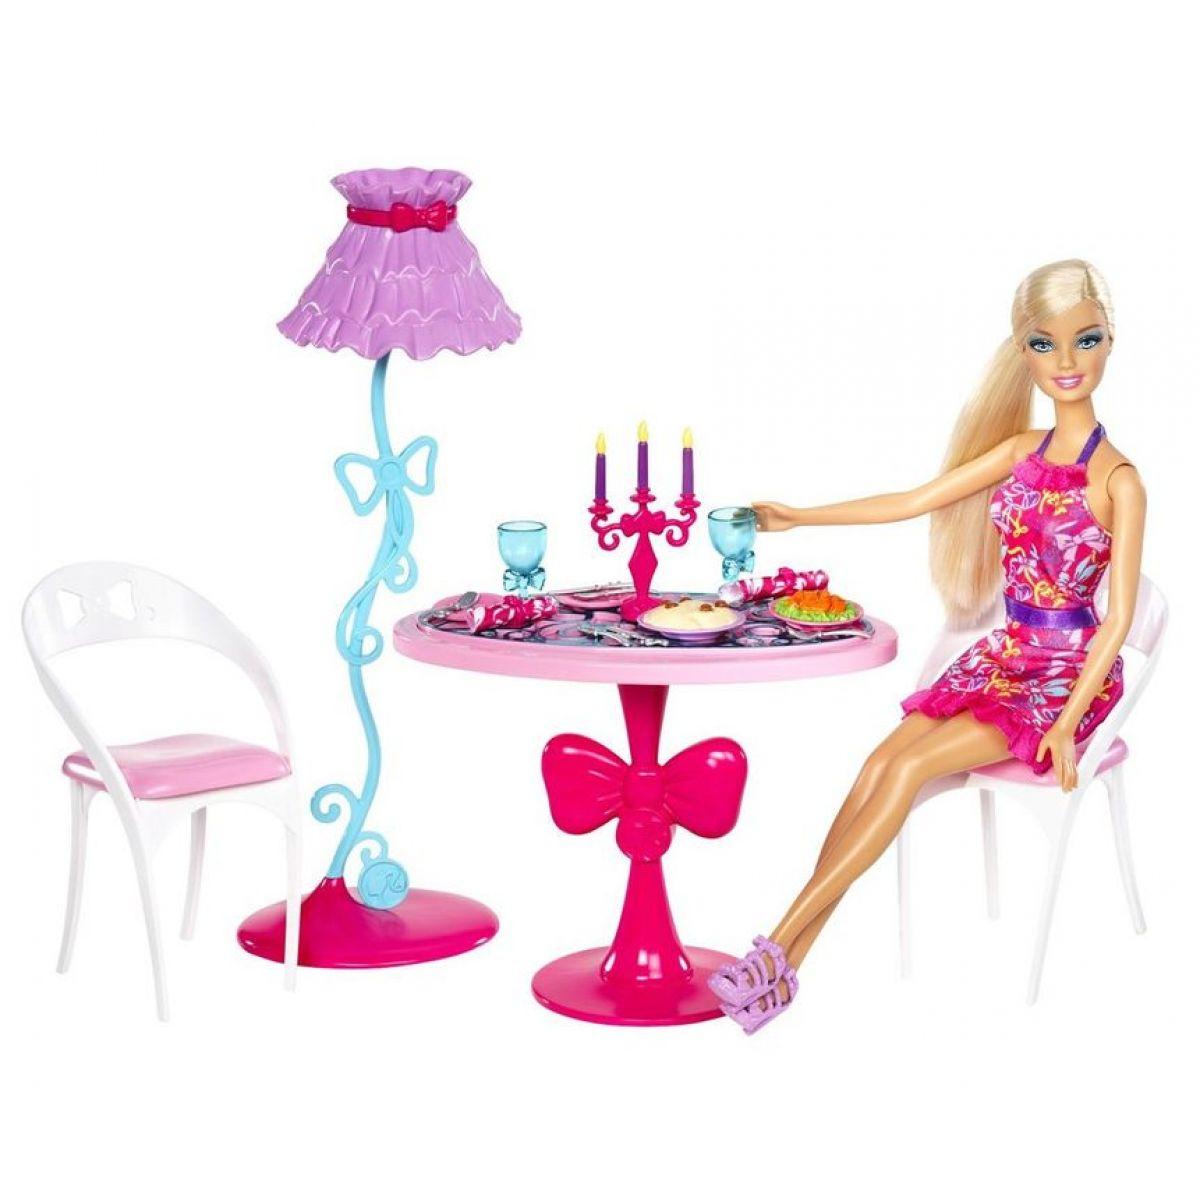 Barbie Panenka a nábytek - Jídelní stůl